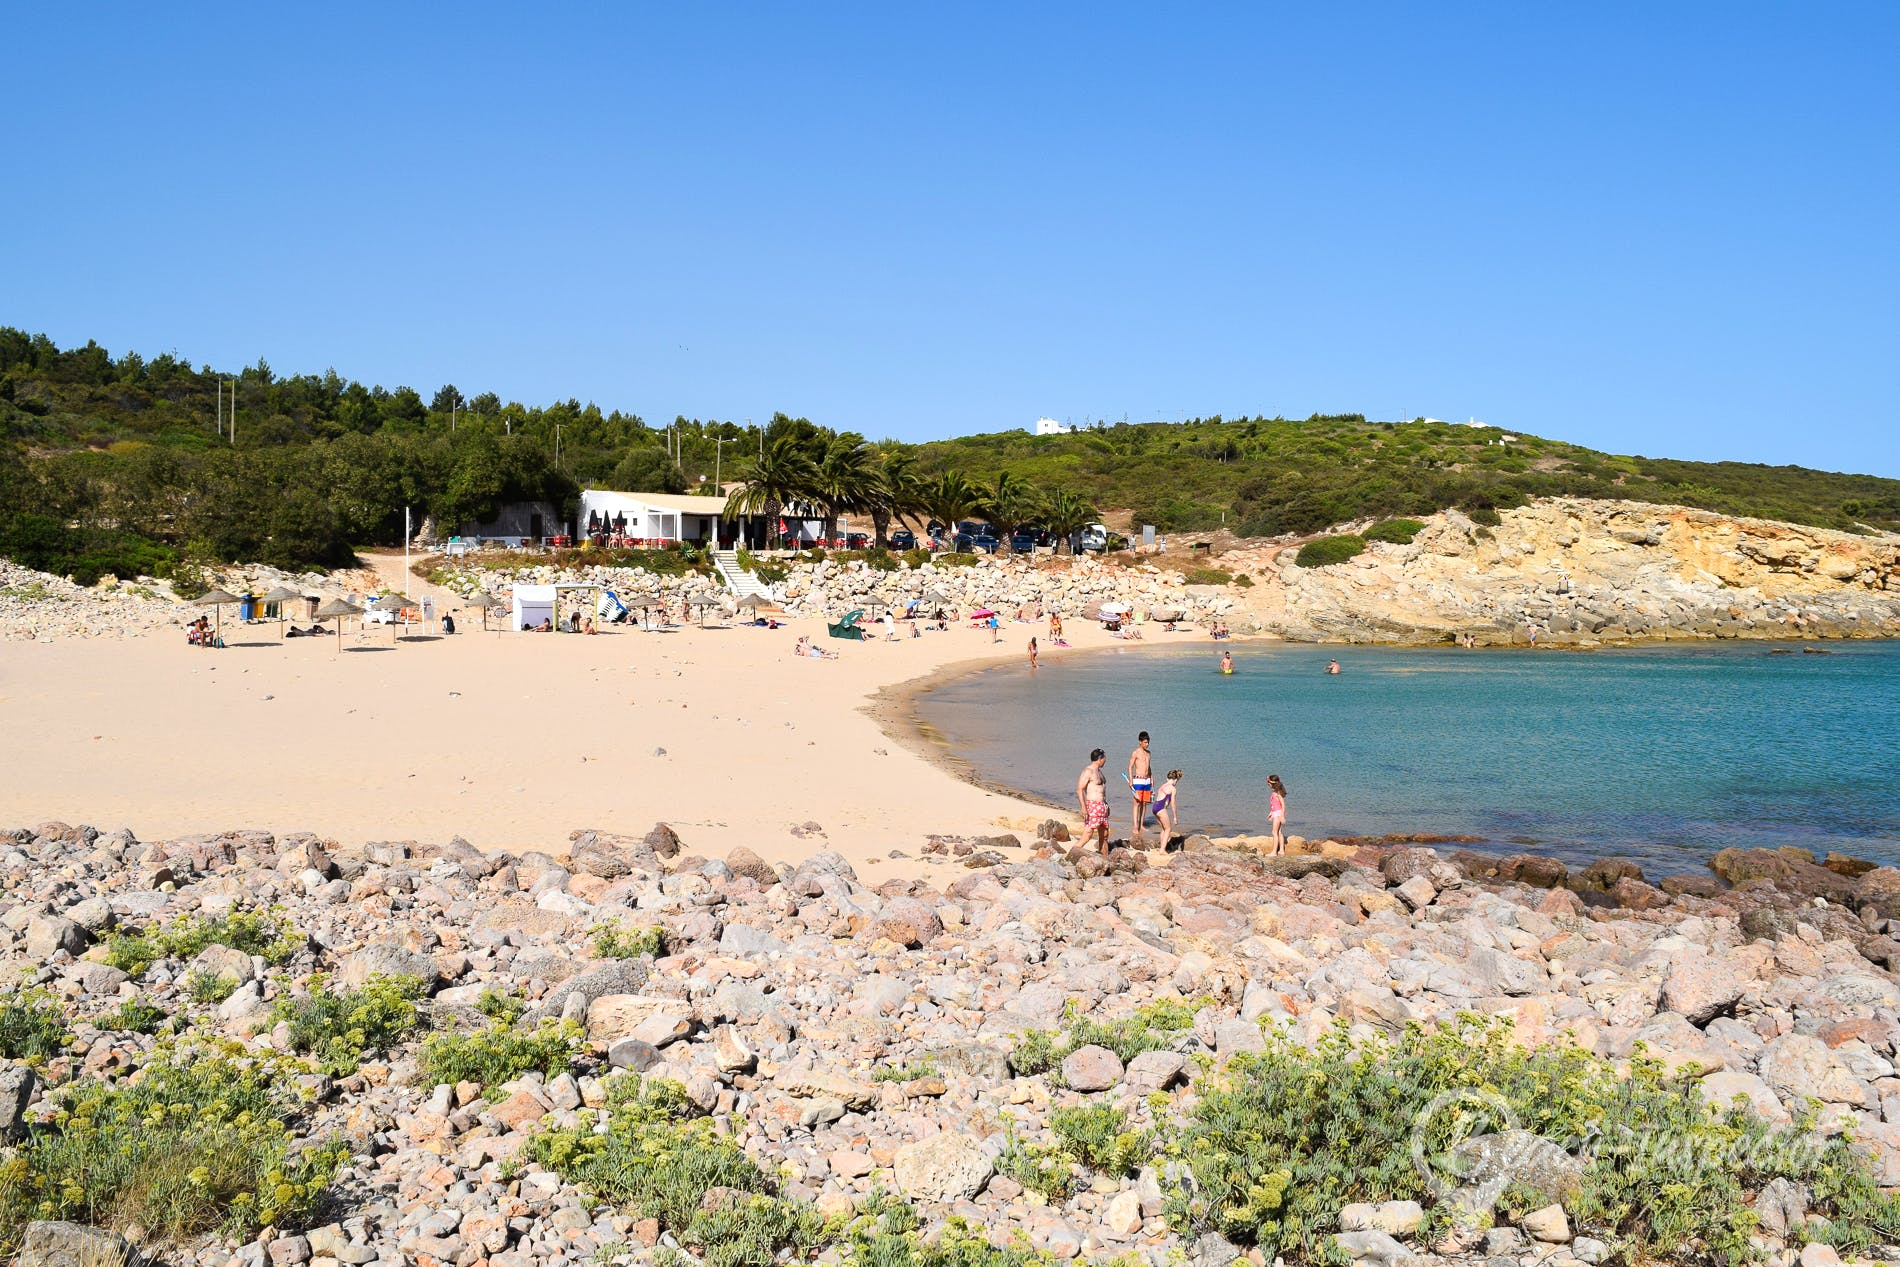 Beach Praia da Ingrina, Algarve, Portugal